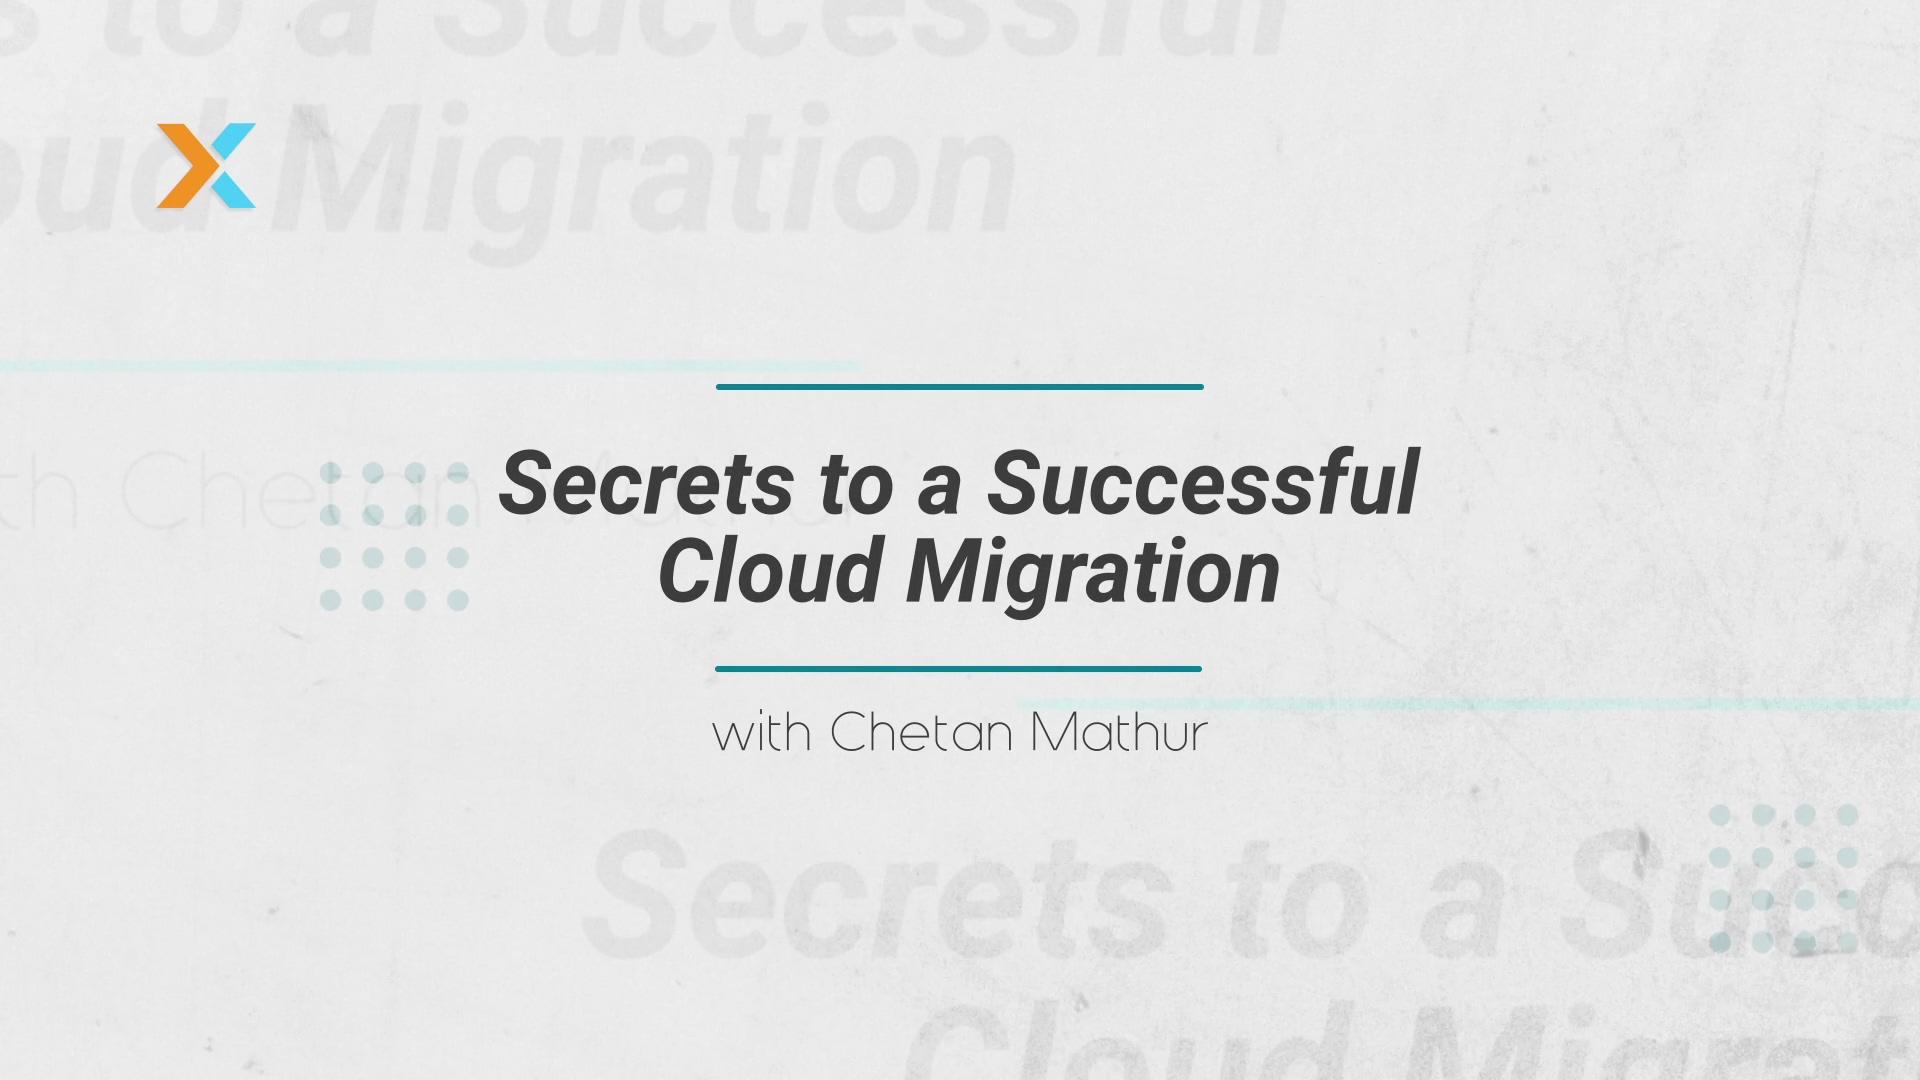 Cloud Migration for CIOs